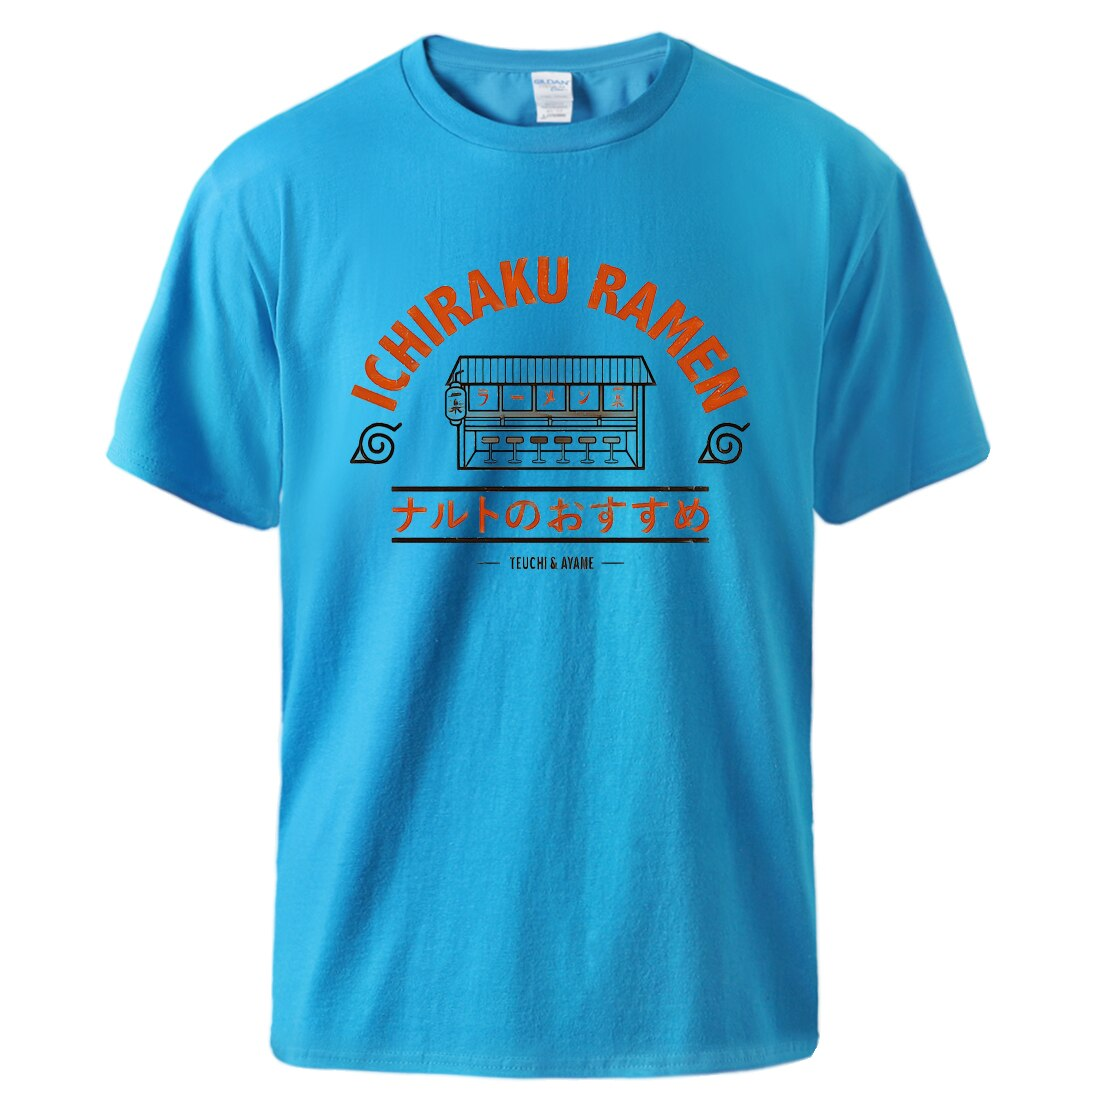 Naruto Ichiraku Ramen T shirts Sommer Mann Top Japan Anime Harajuku Kühlen Kurzarm Baumwolle t-shirts Sportswear Männlichen Schwarz T